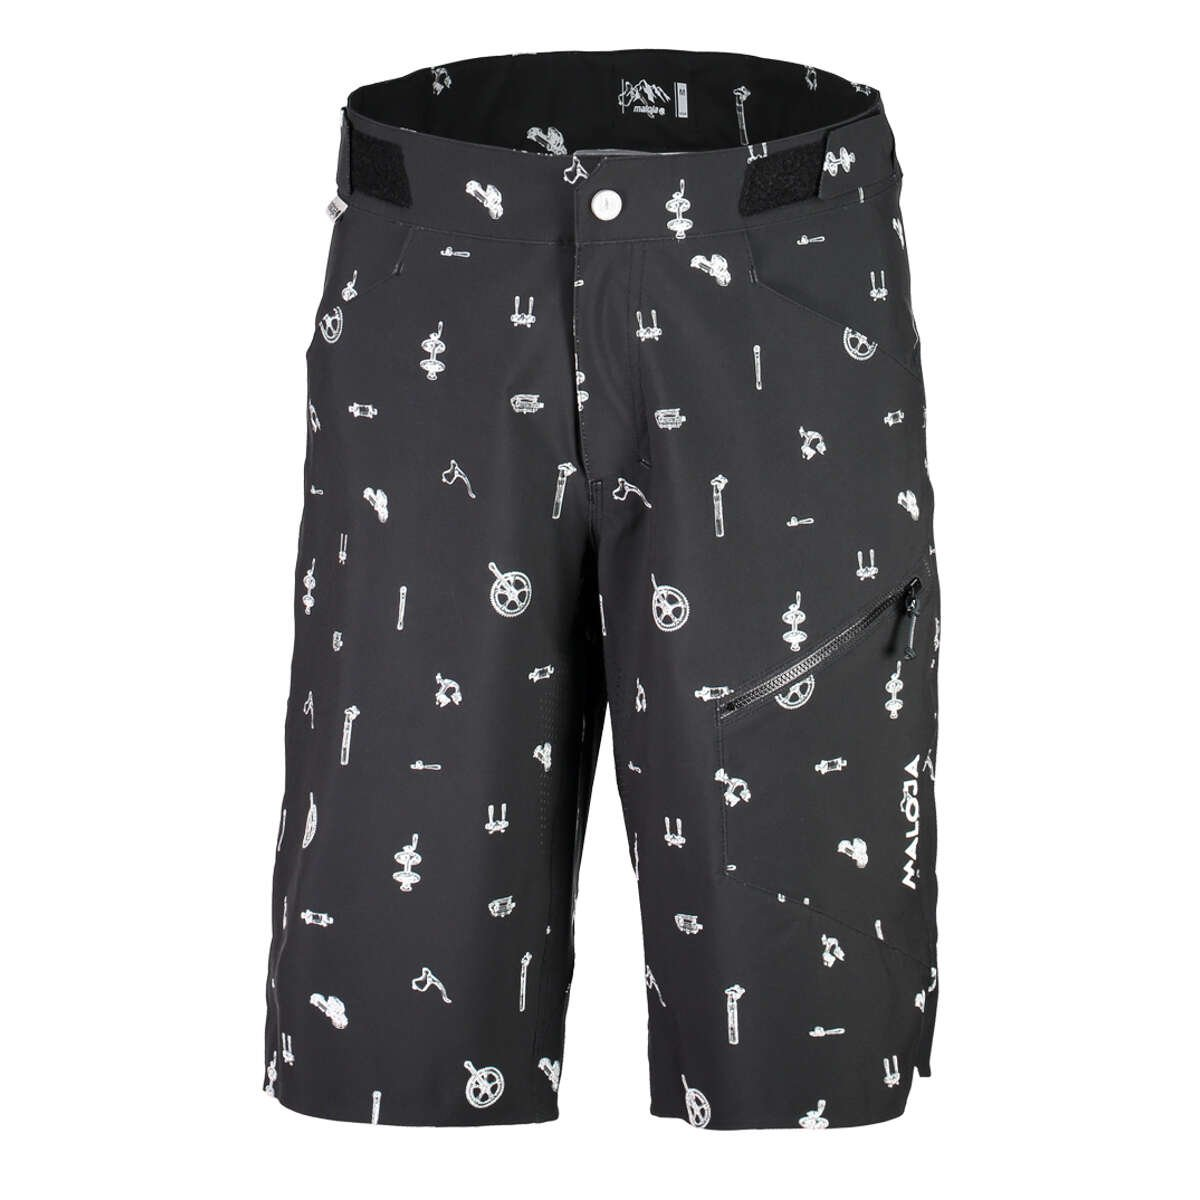 Maloja luism Printed Shorts, Kurze XXL